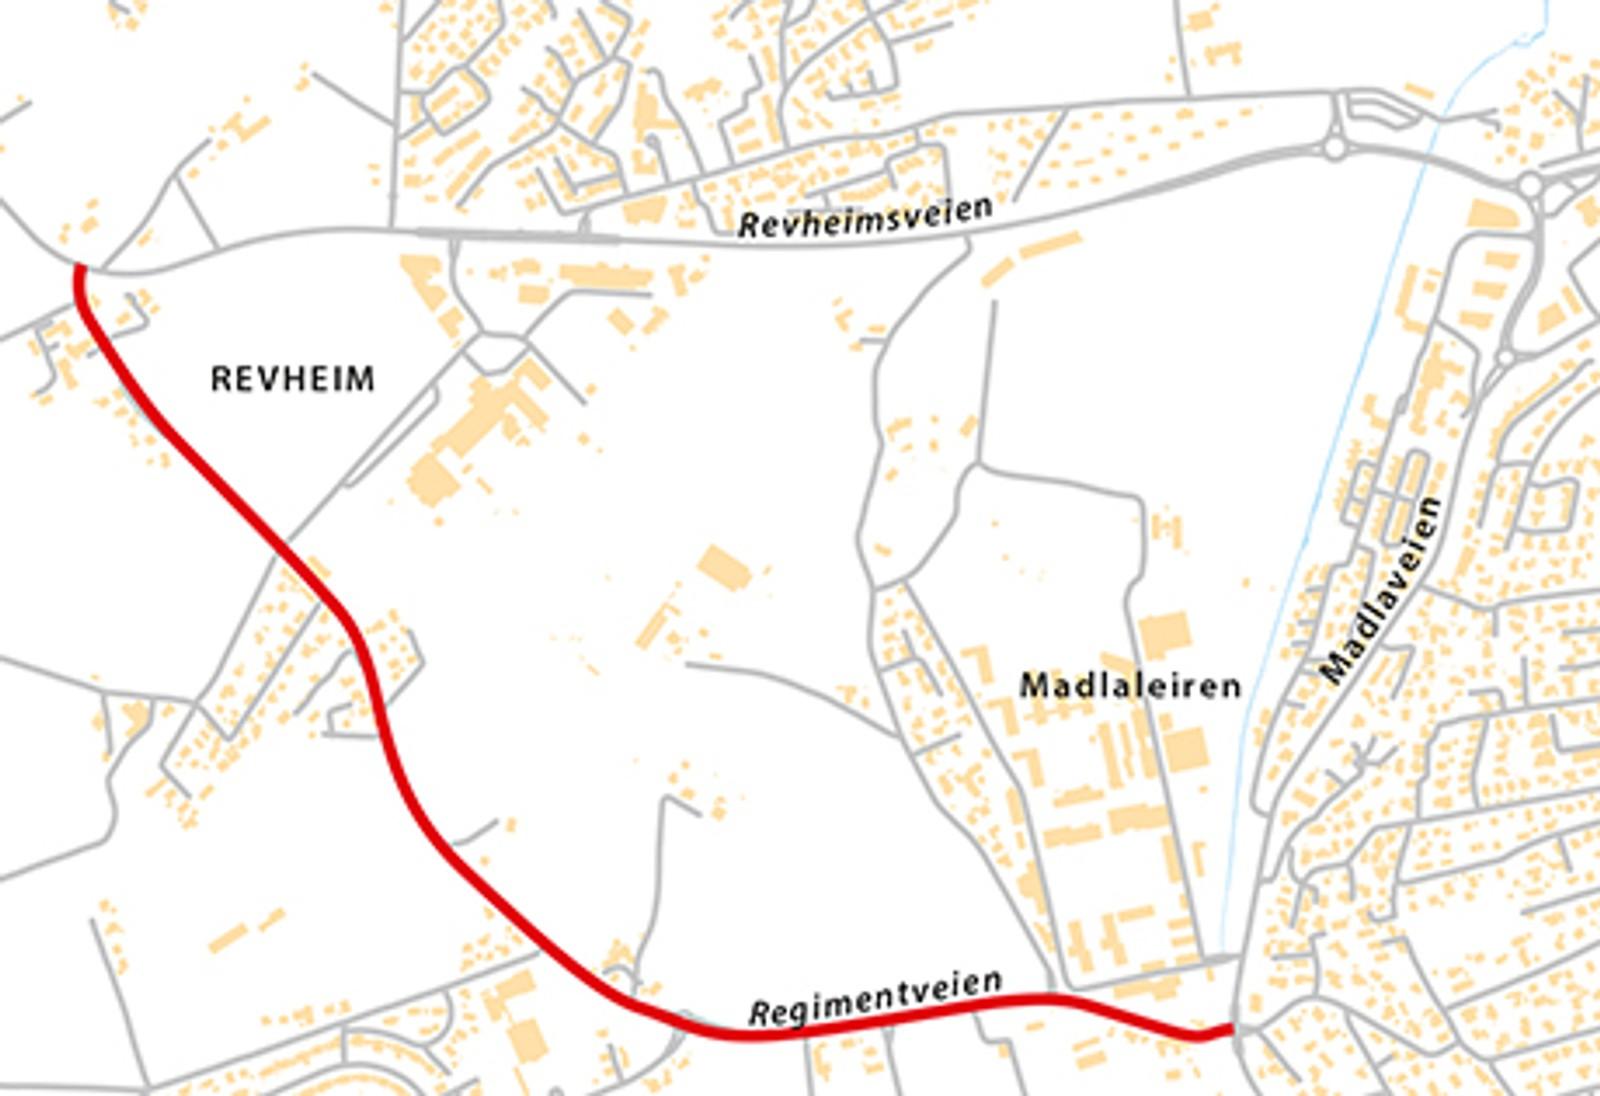 Regimentveien (Fv405), natt til onsdag 6. mai.